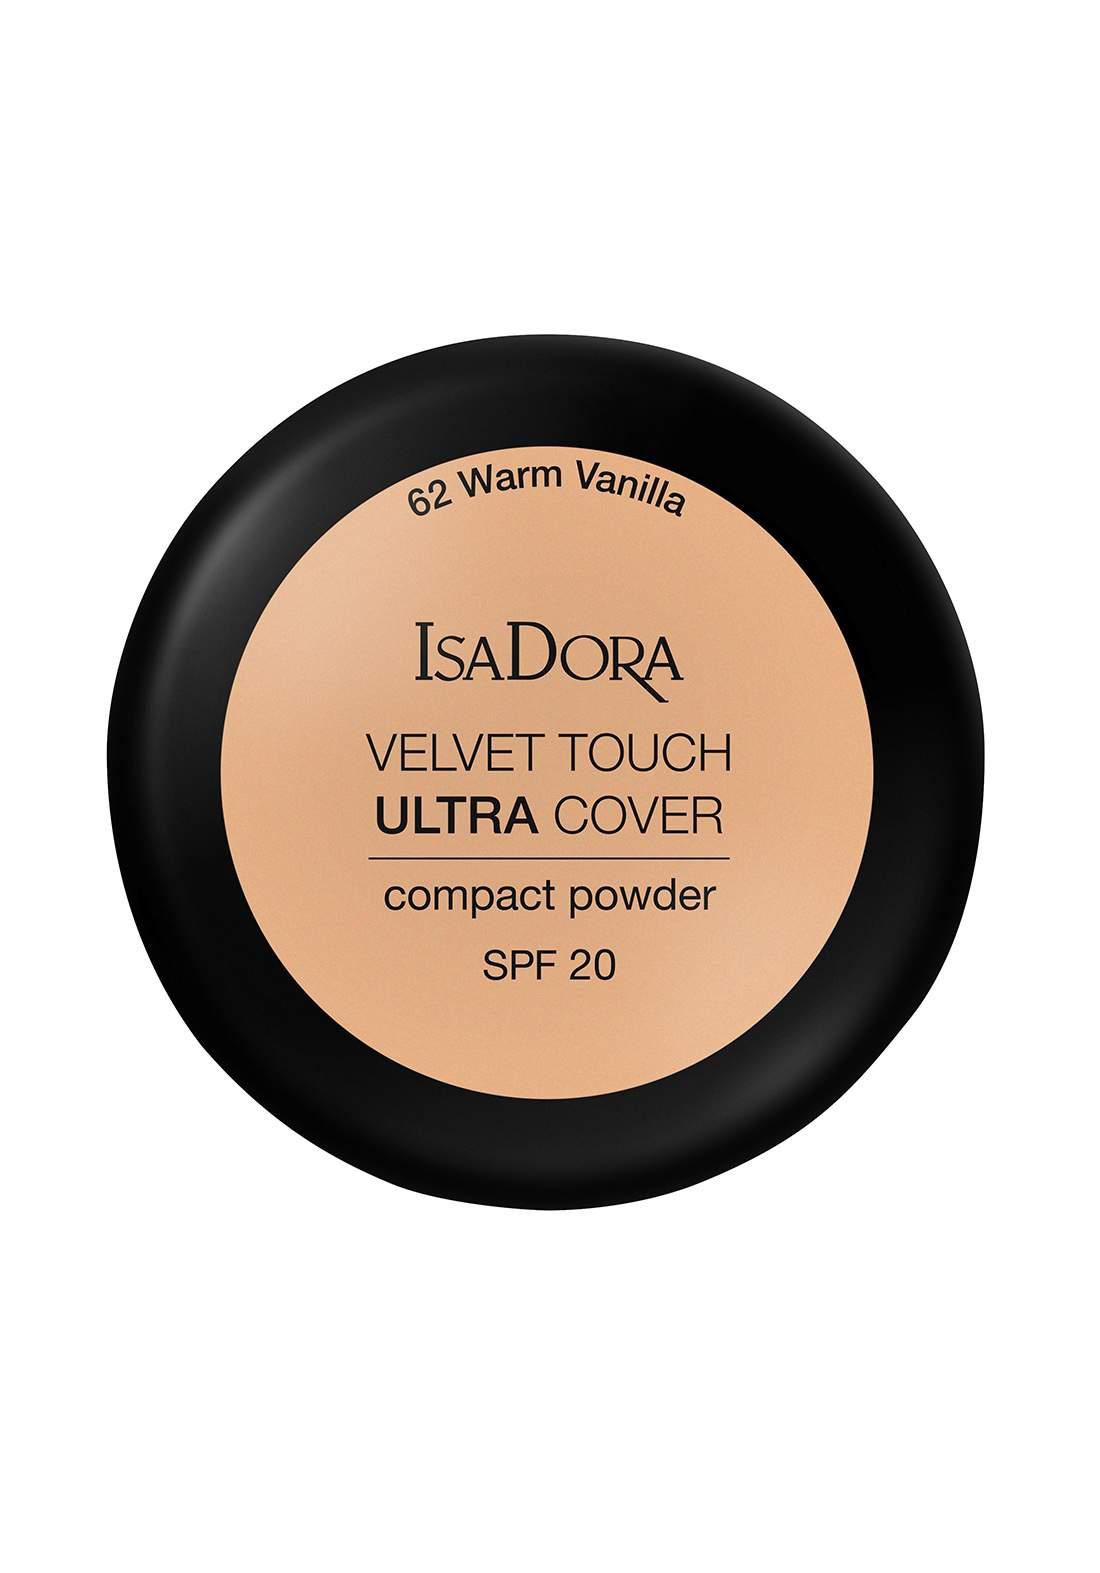 IsaDora 317102 Velvet Touch Sheer Cover Compact Powder Warm Vanilla SPF 20 NO.62 بودرة